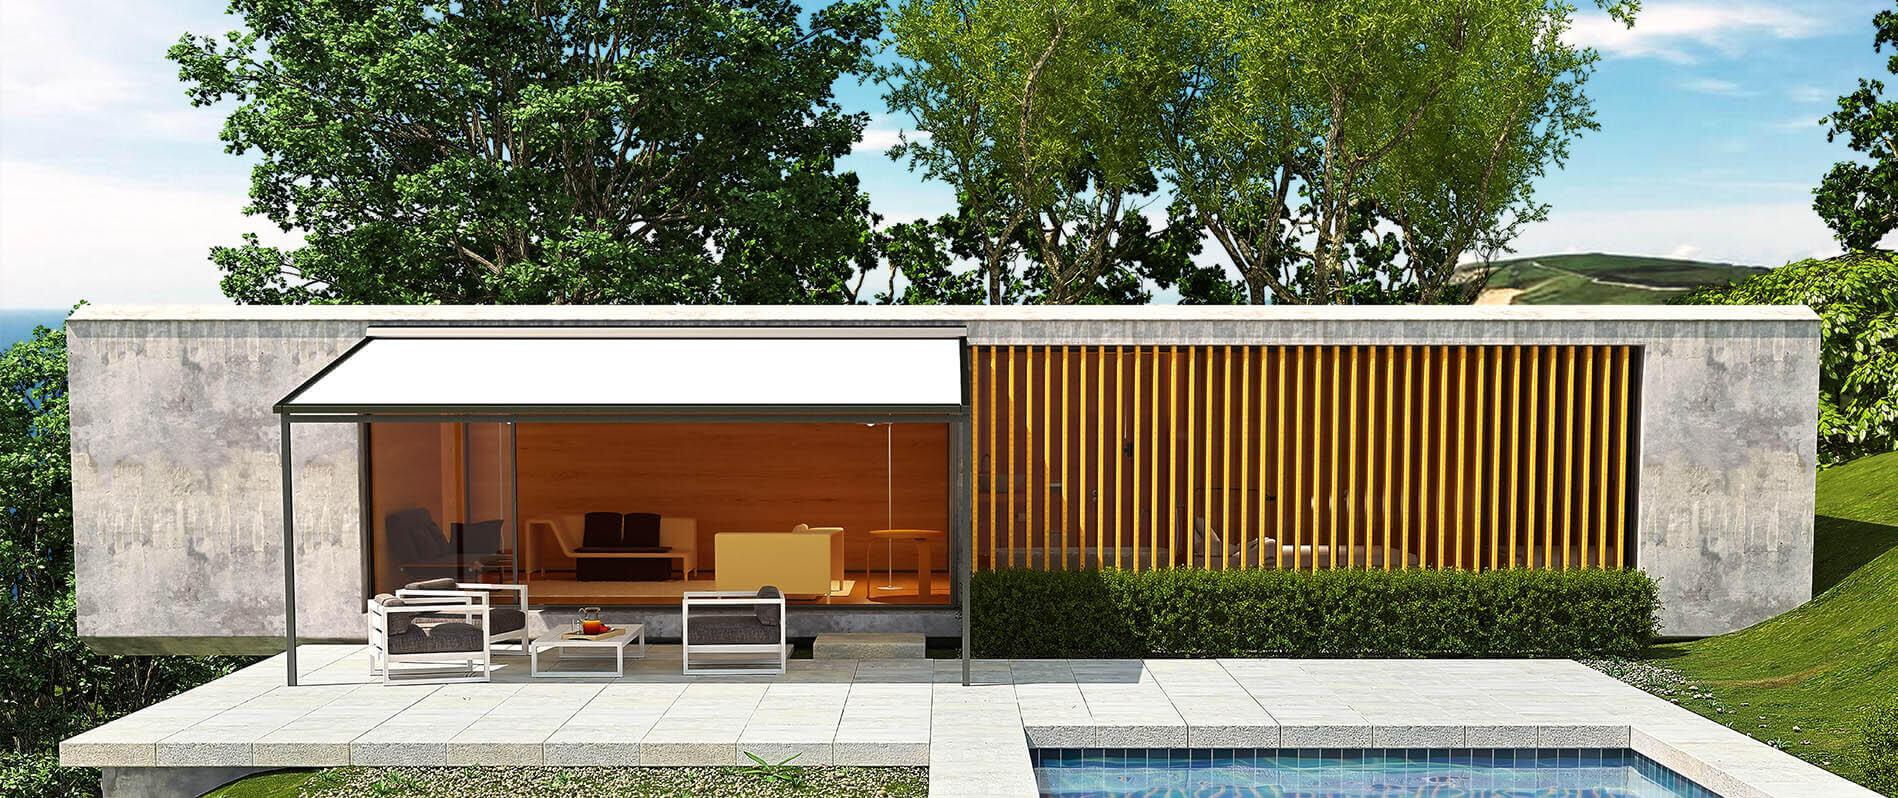 Pergola-Überdachung auf Terrasse neben Pool